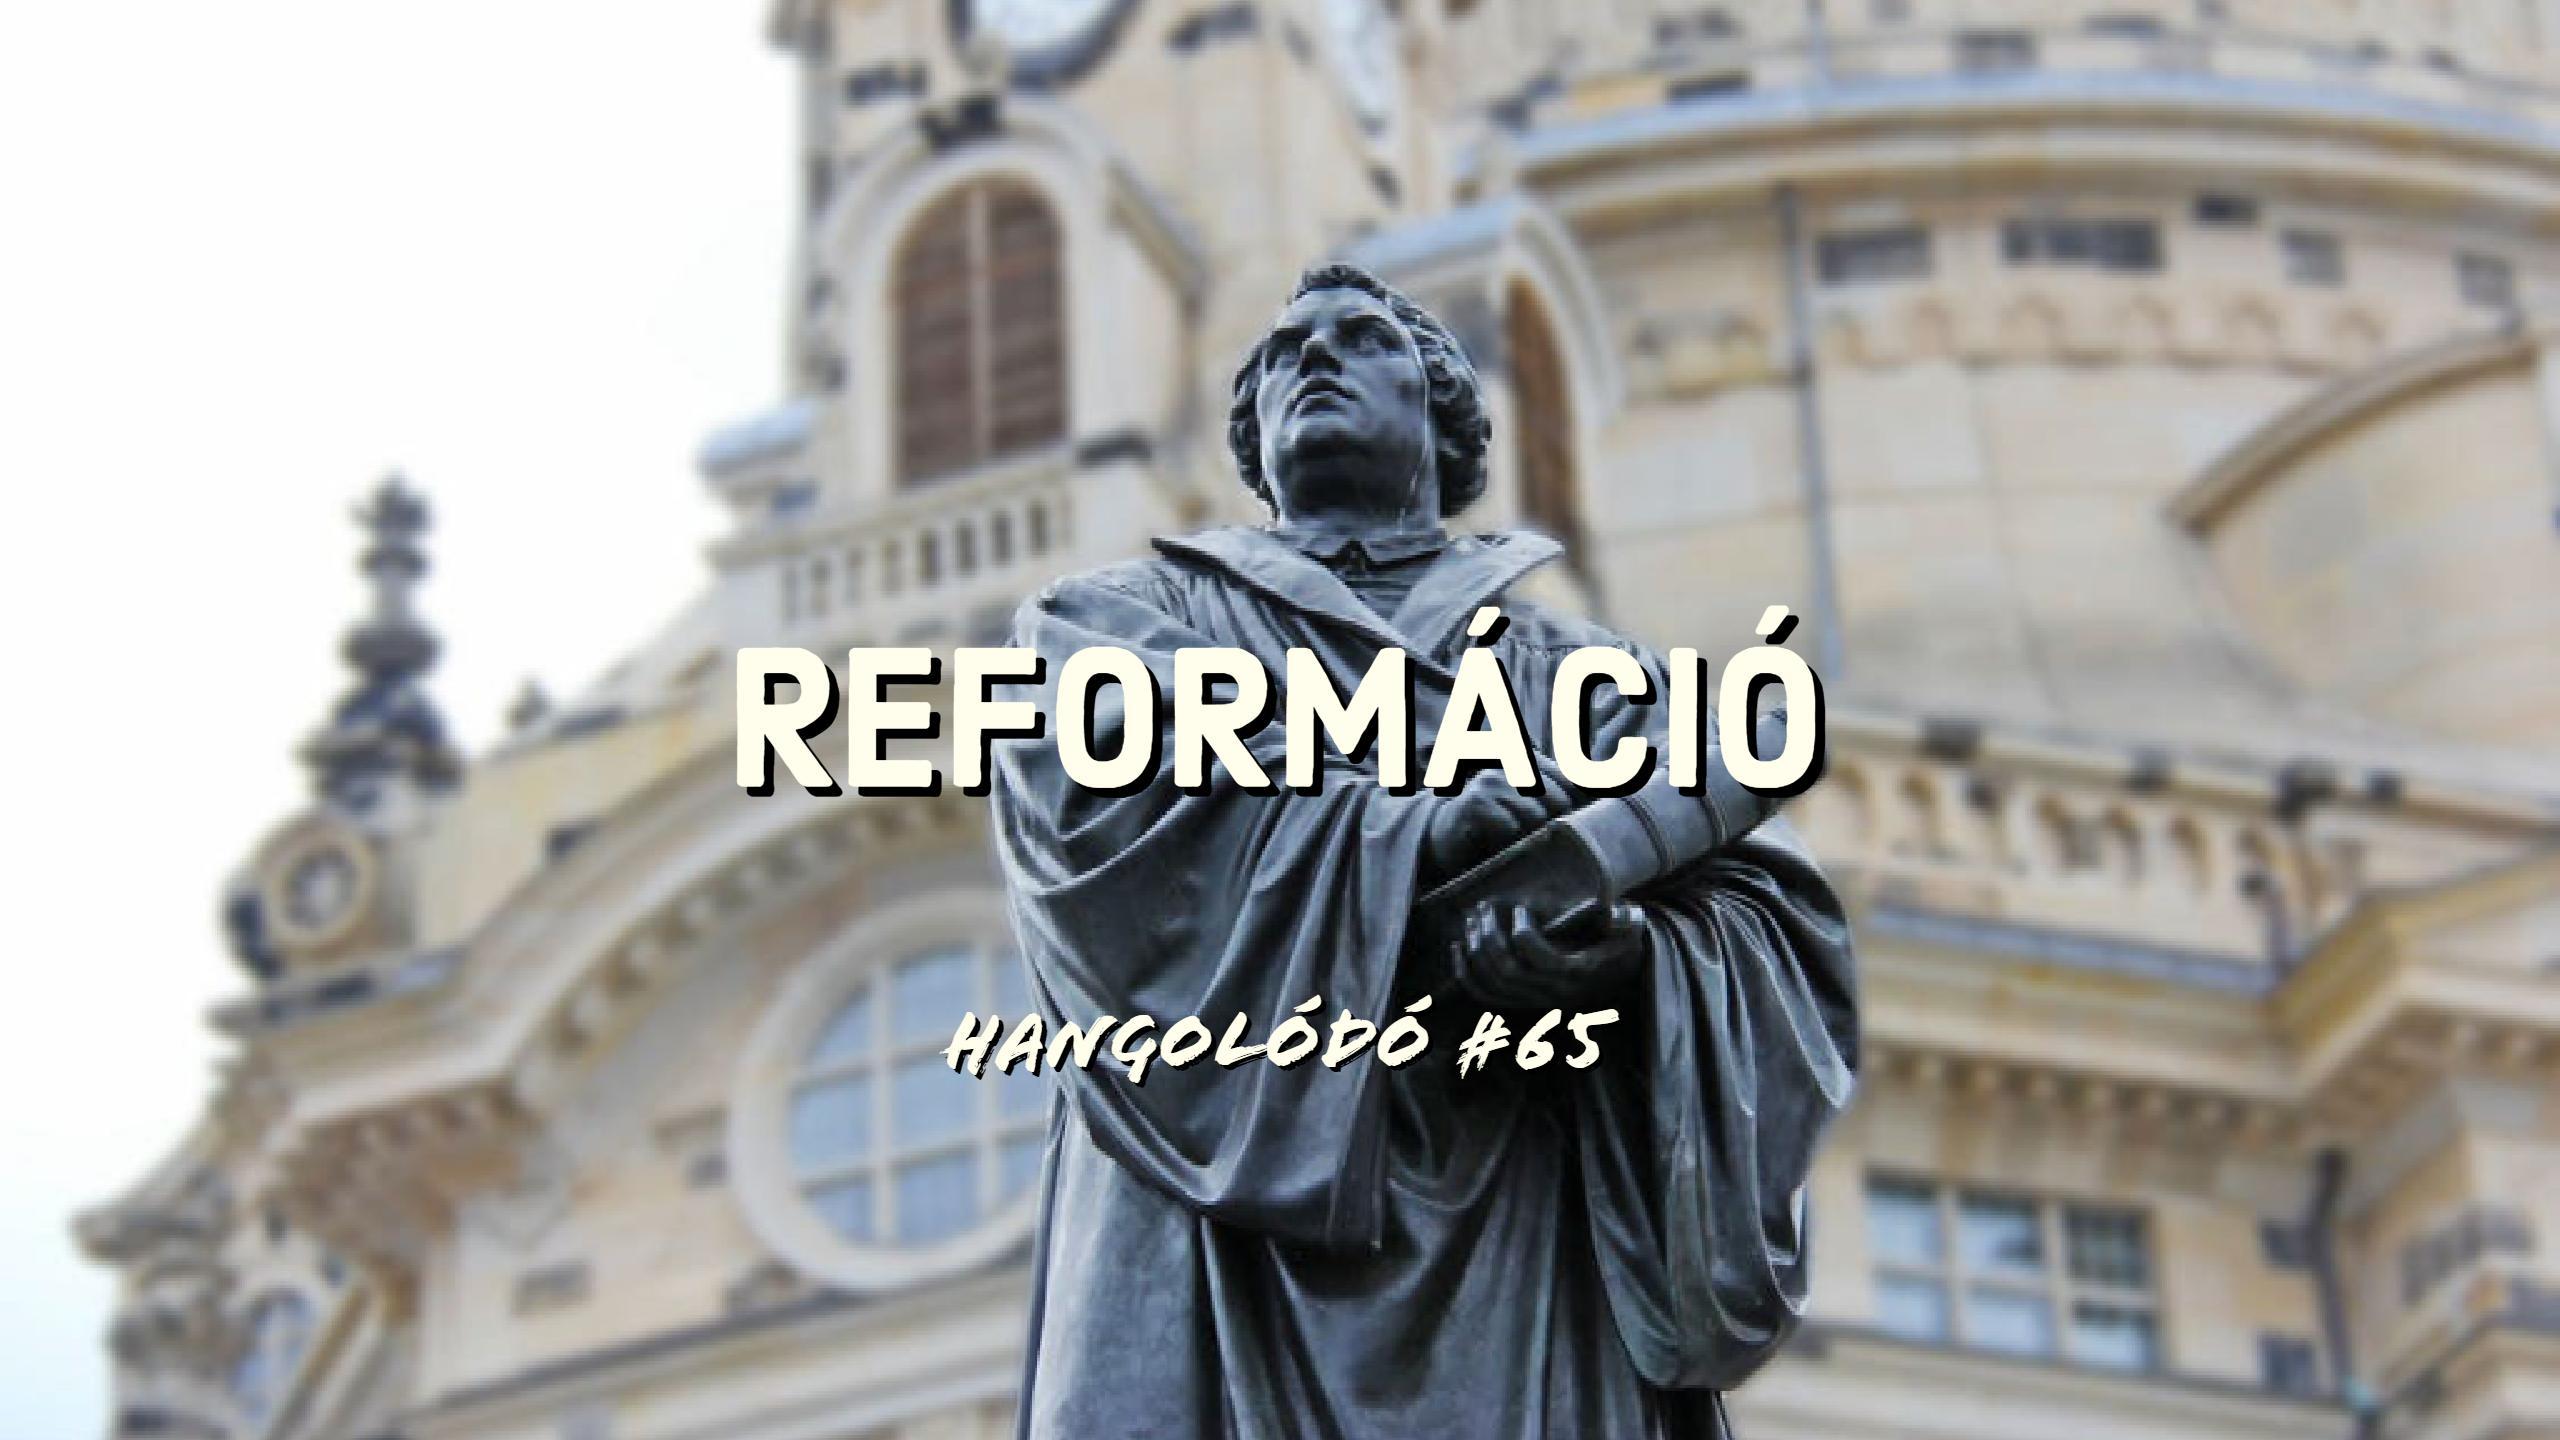 Hangolódó #65   Reformáció